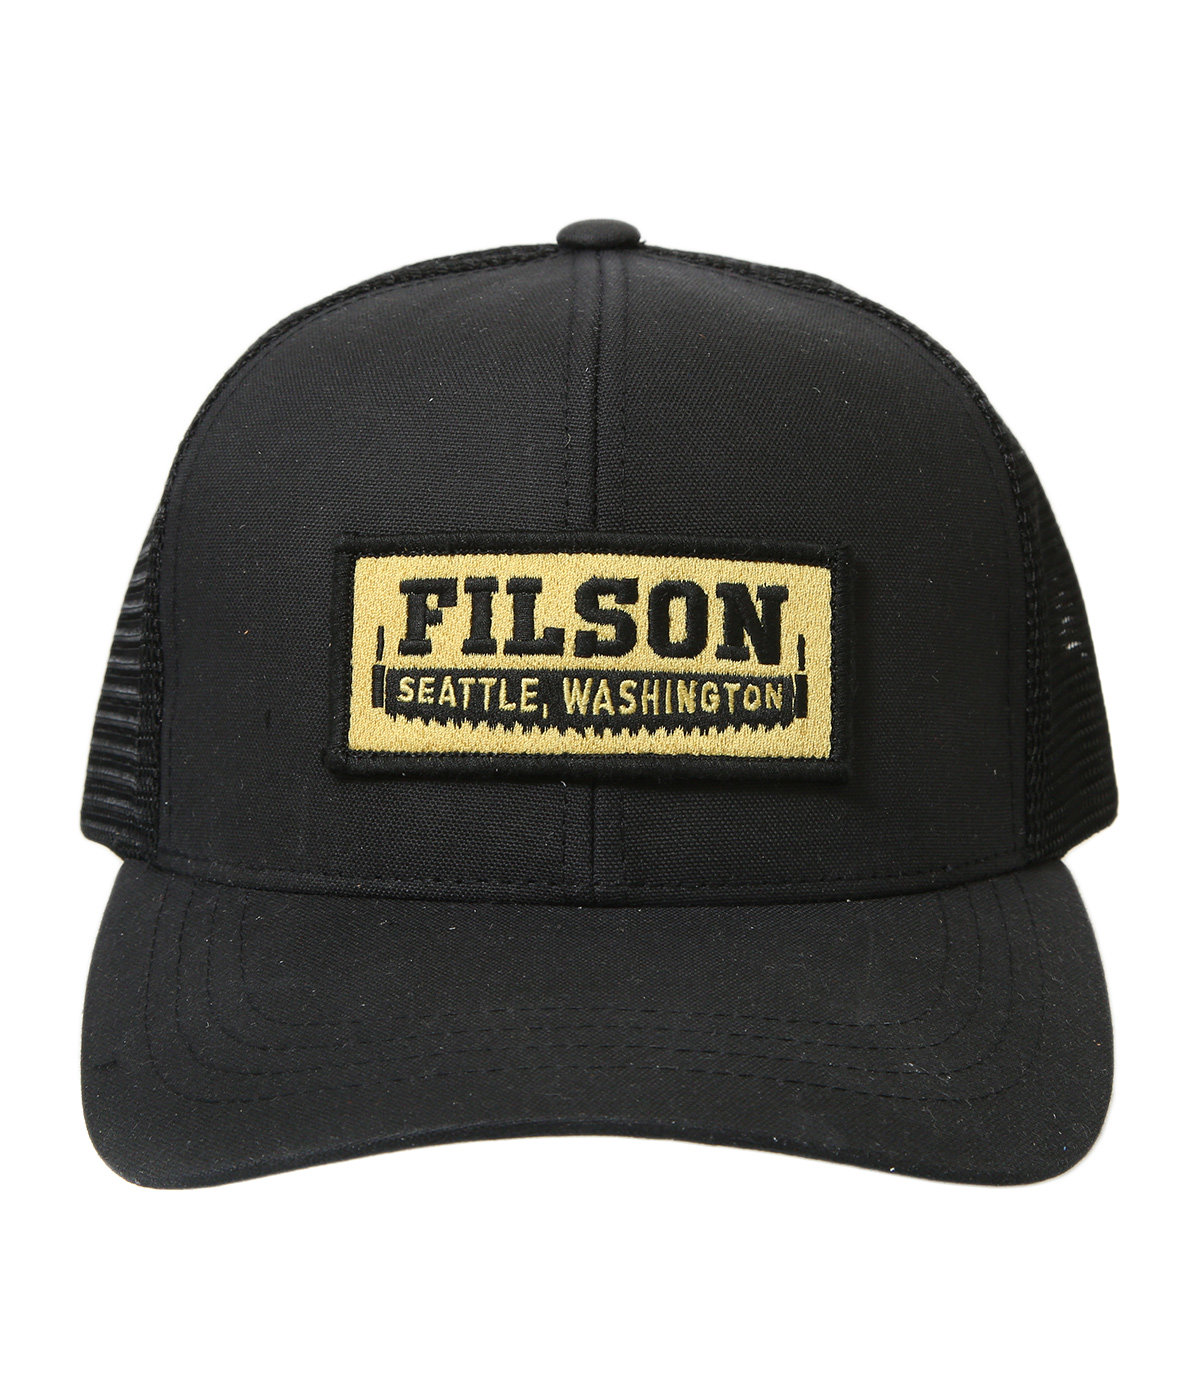 LOGGER MESH CAP